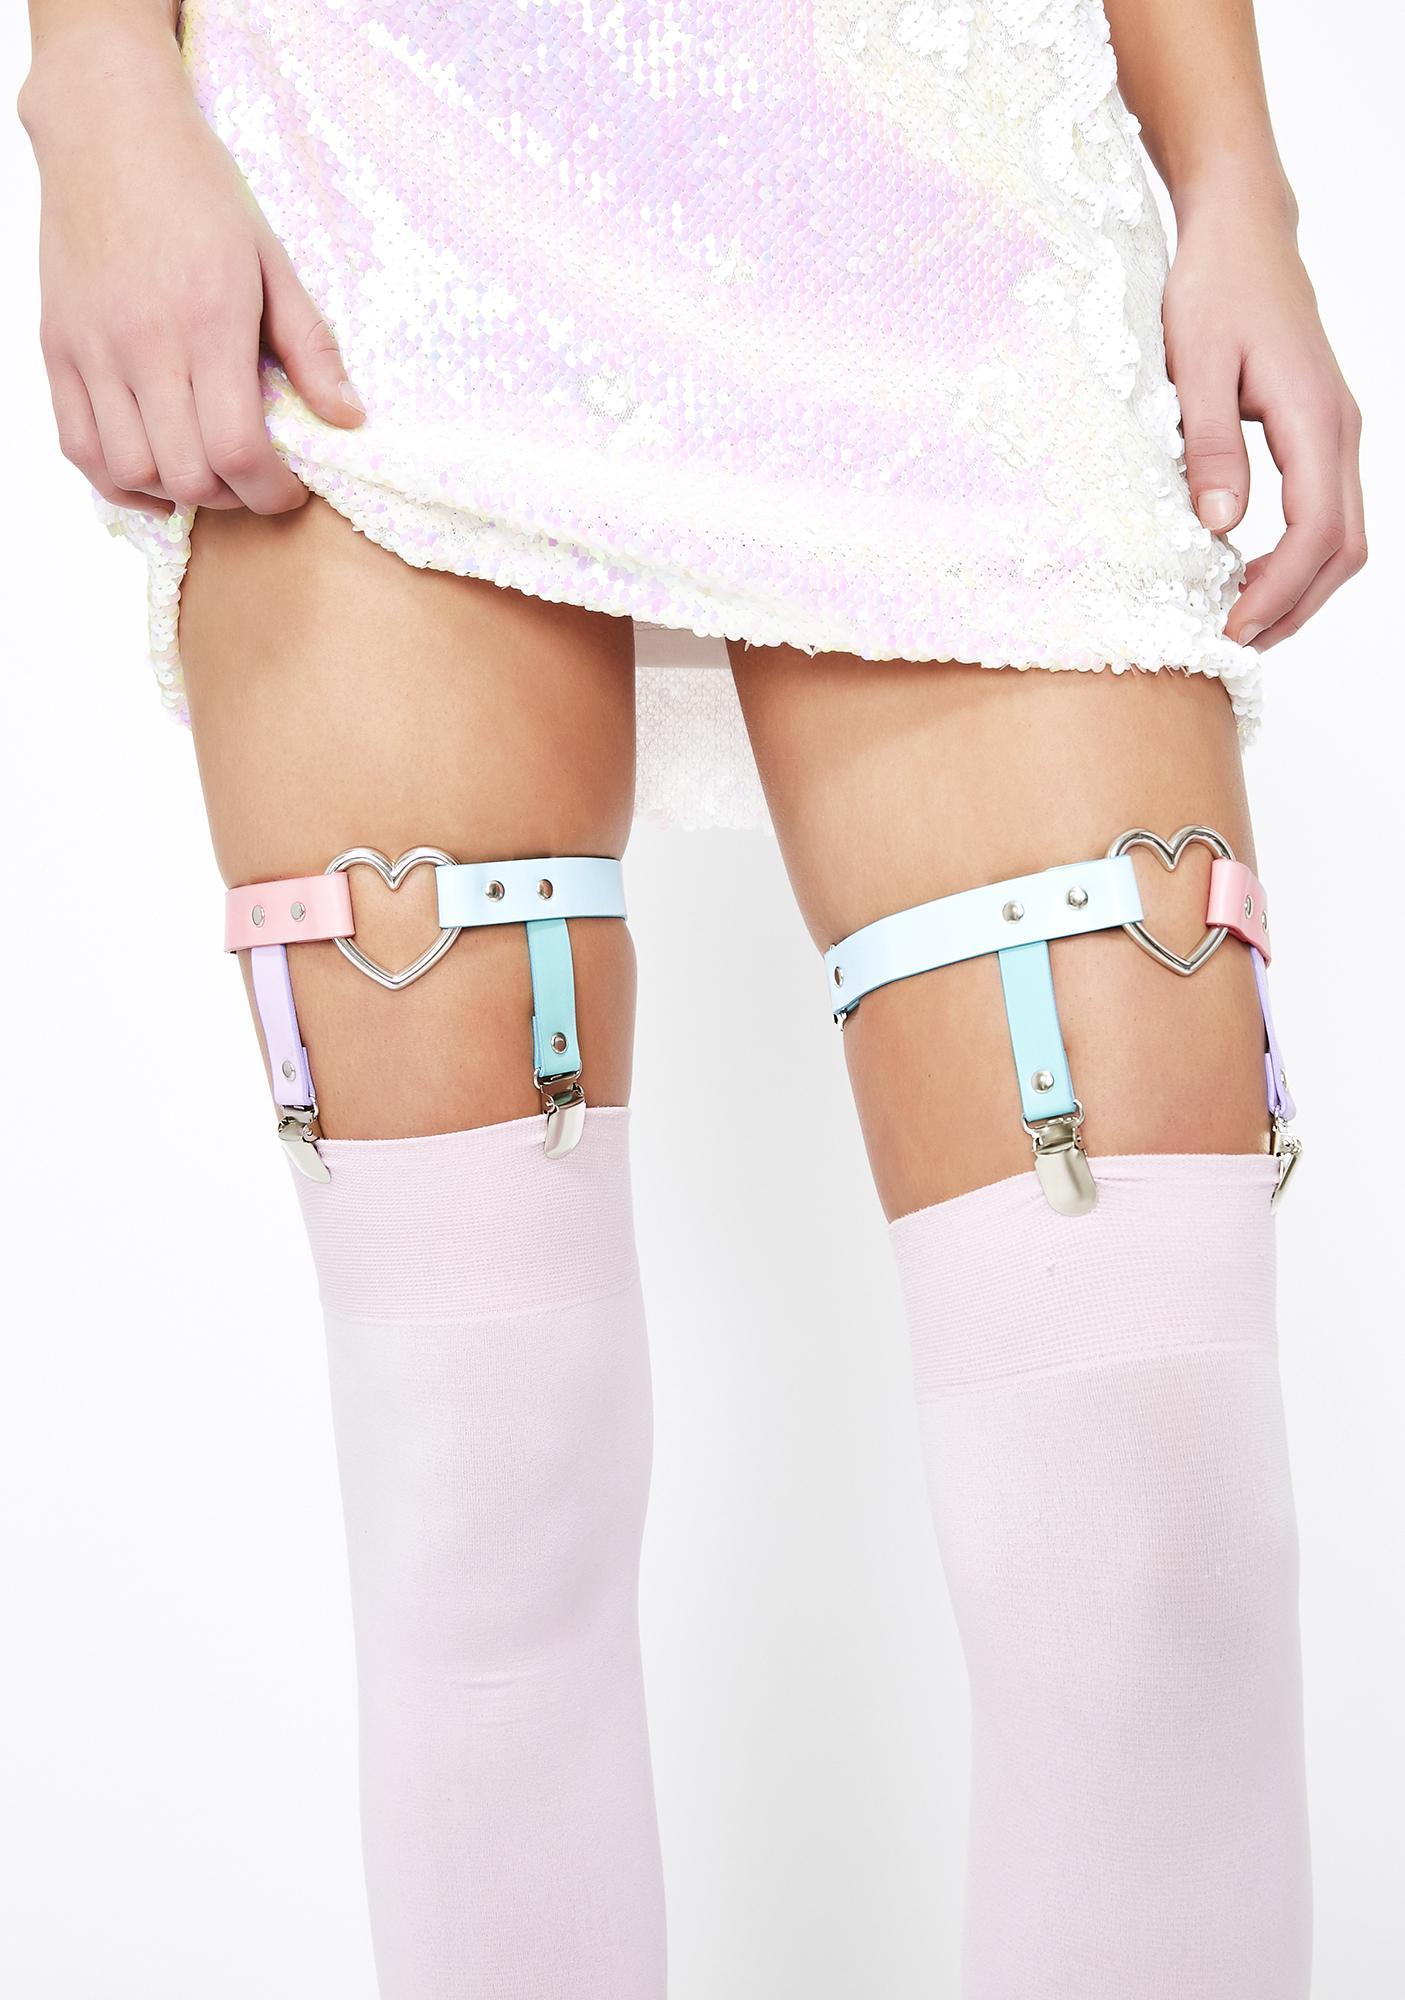 Playdate Princess Harness Garter Set